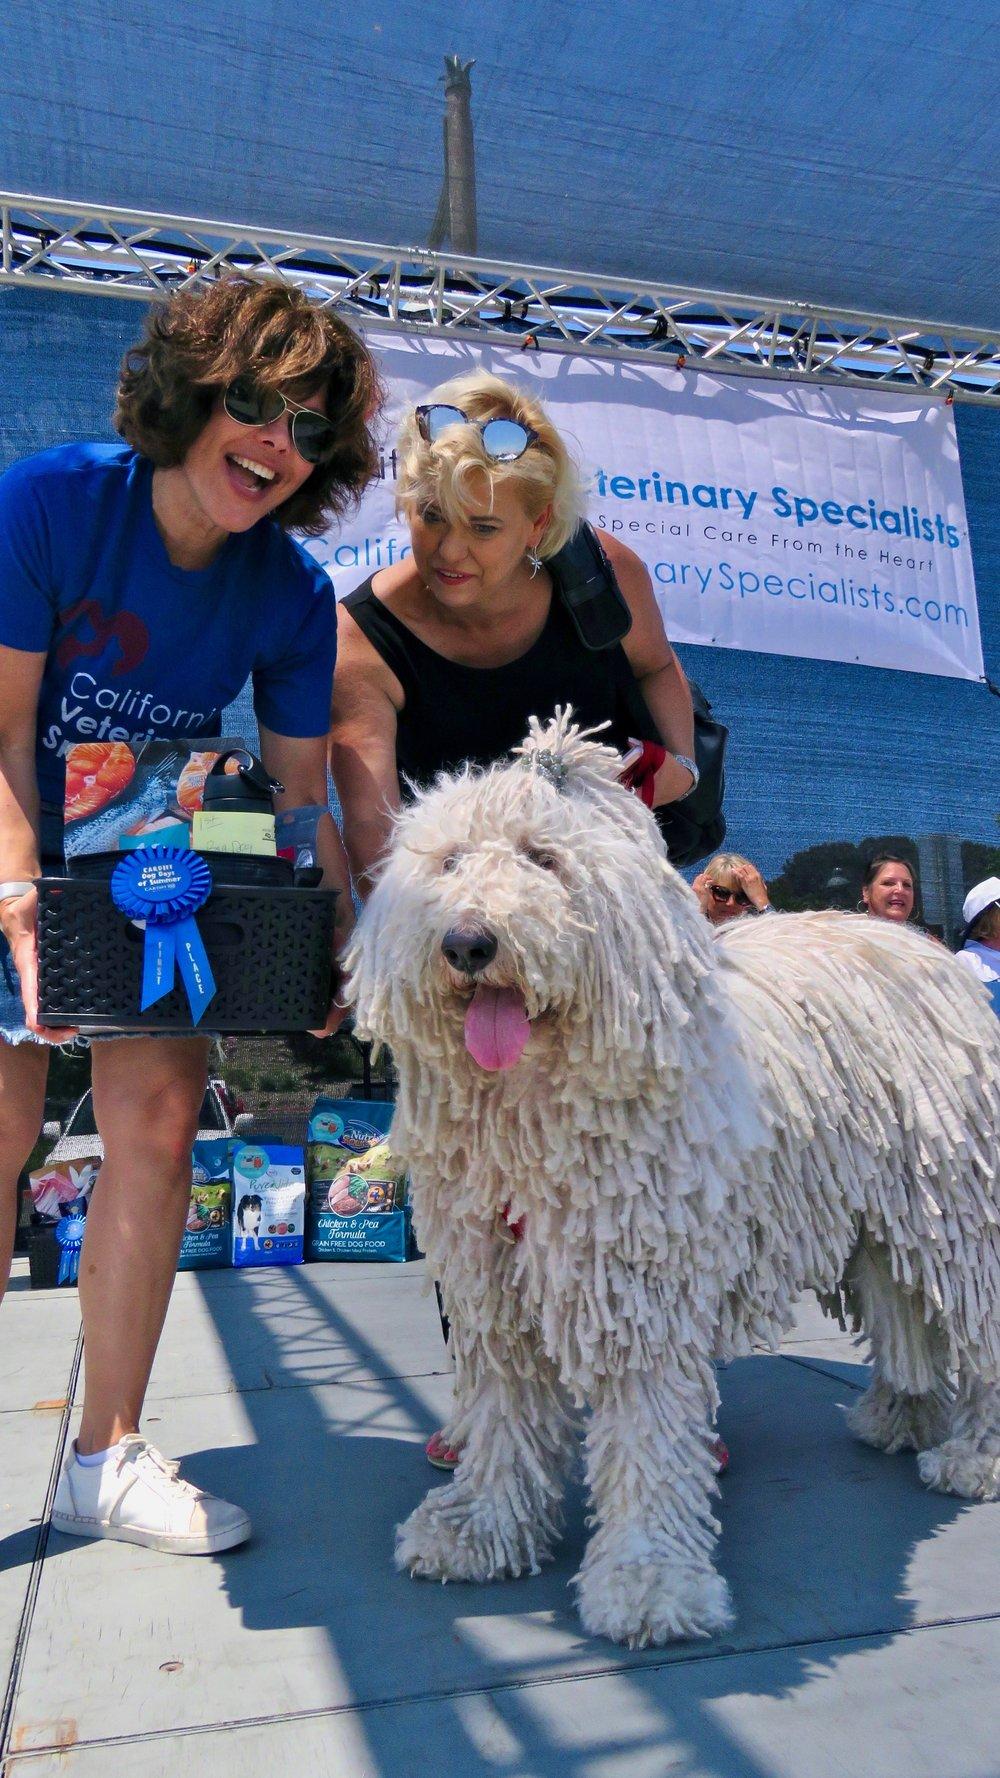 2018 Ultimate Dog Lover Sponsor CVA California Veterinary Specialists participating in popular dog contest